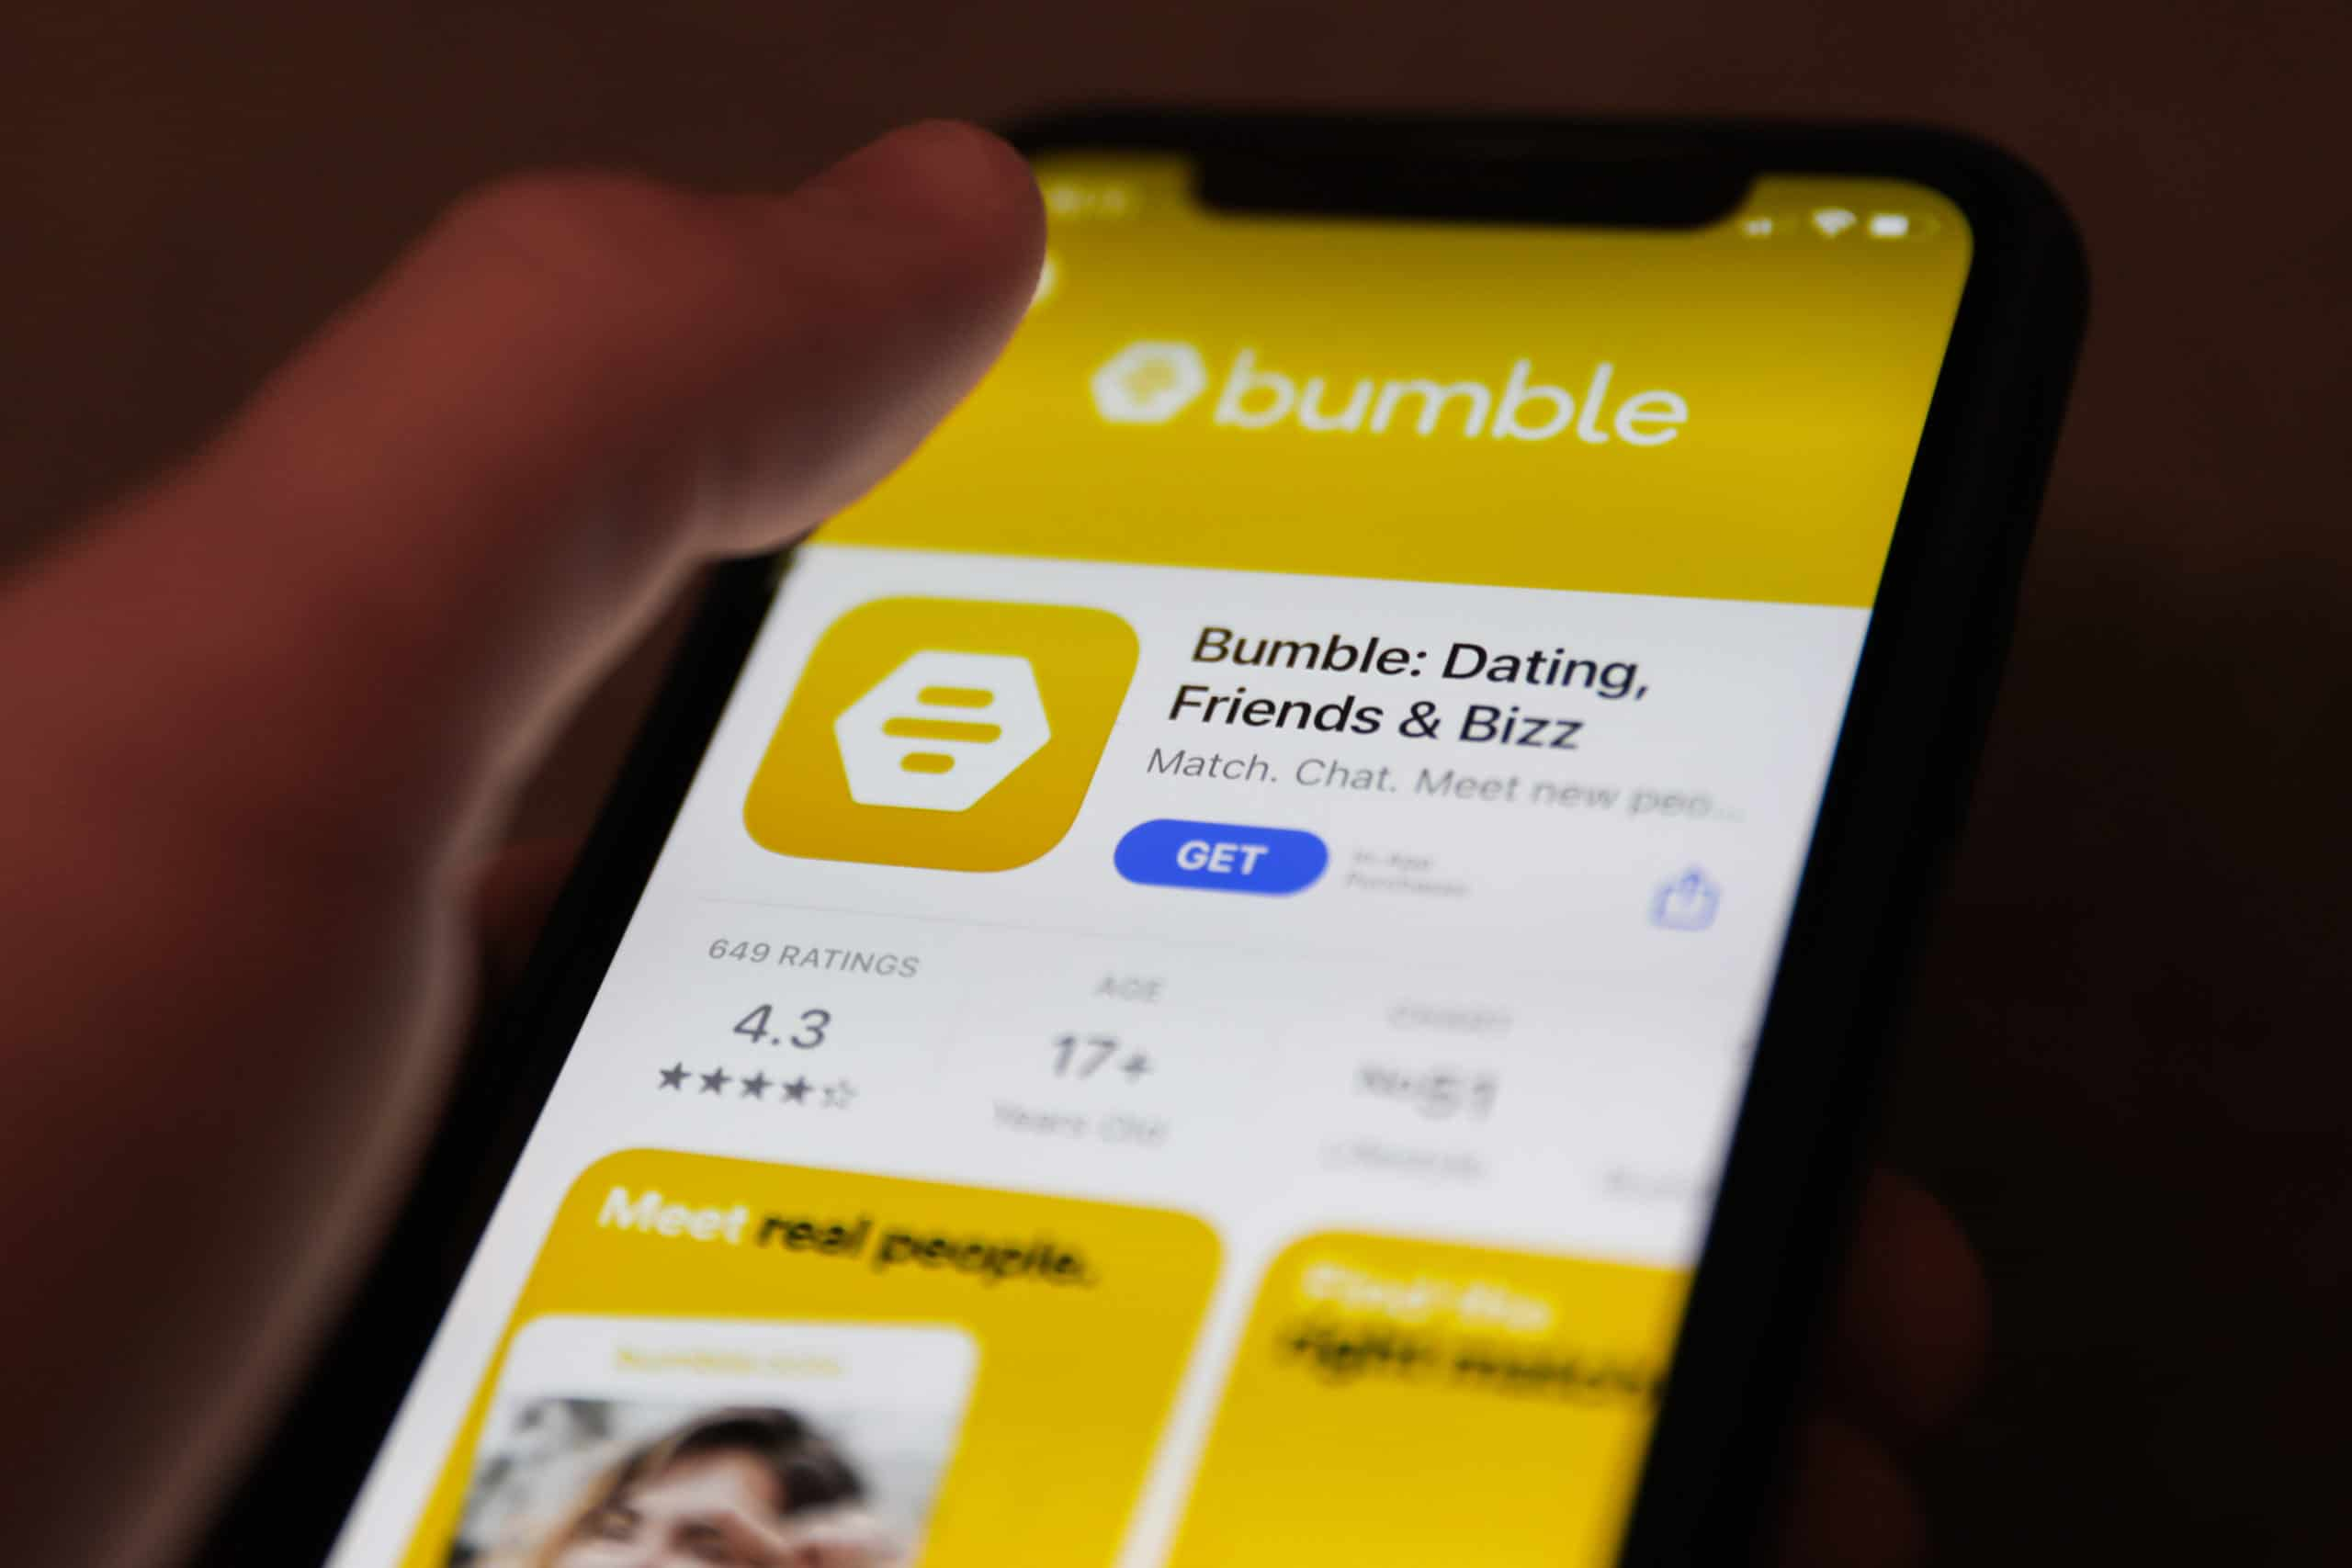 Bumble App Photo Illustrations